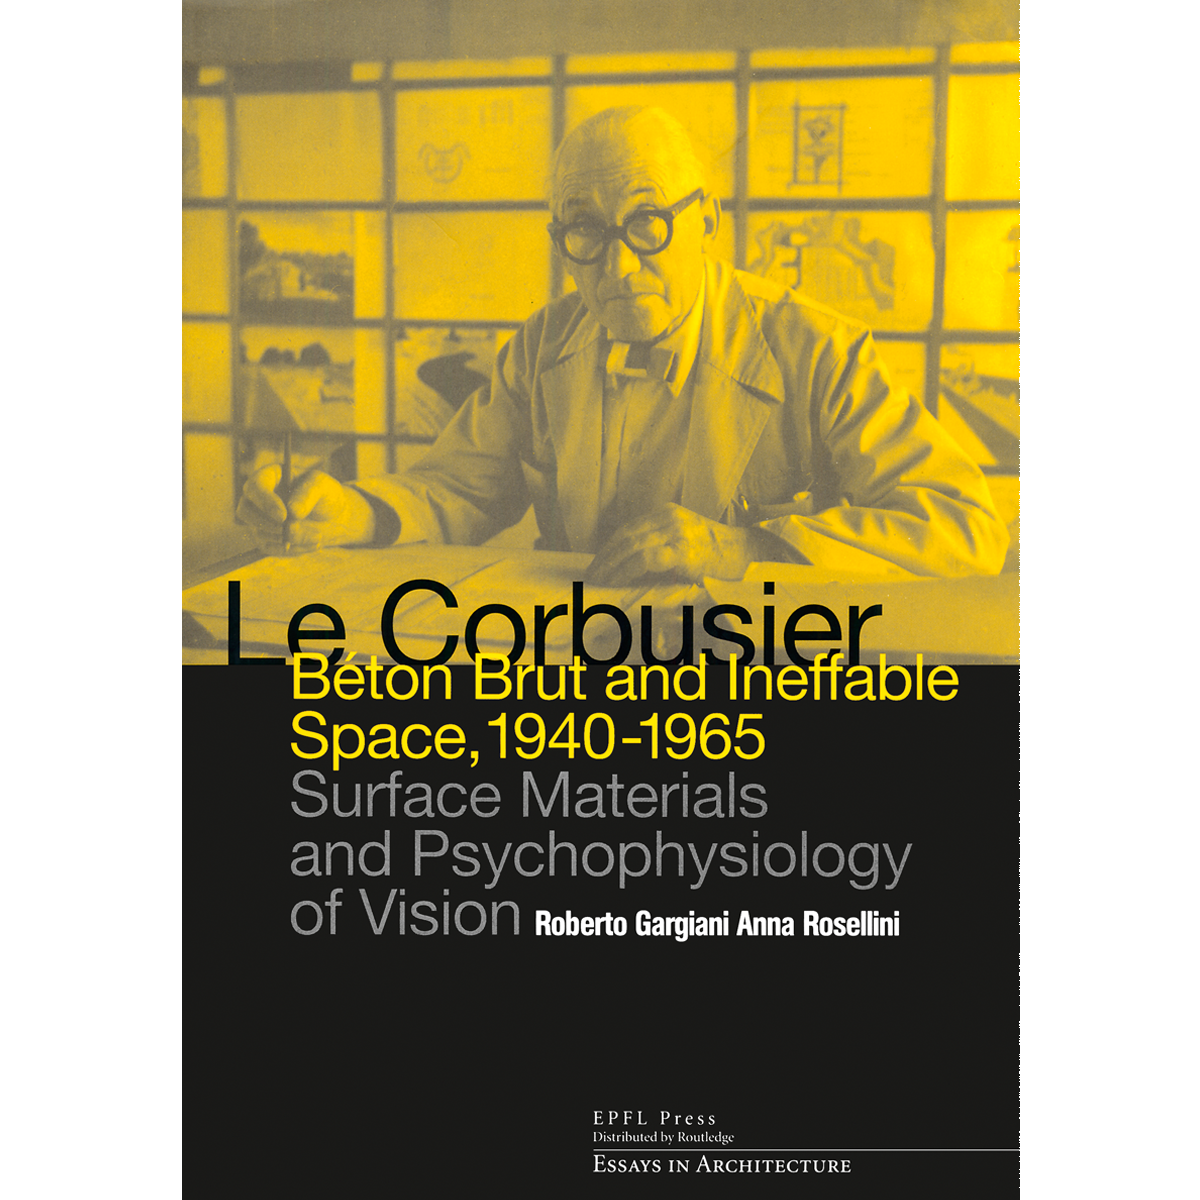 Le Corbusier: Béton Brut  and Ineffable Space, 1940-1965